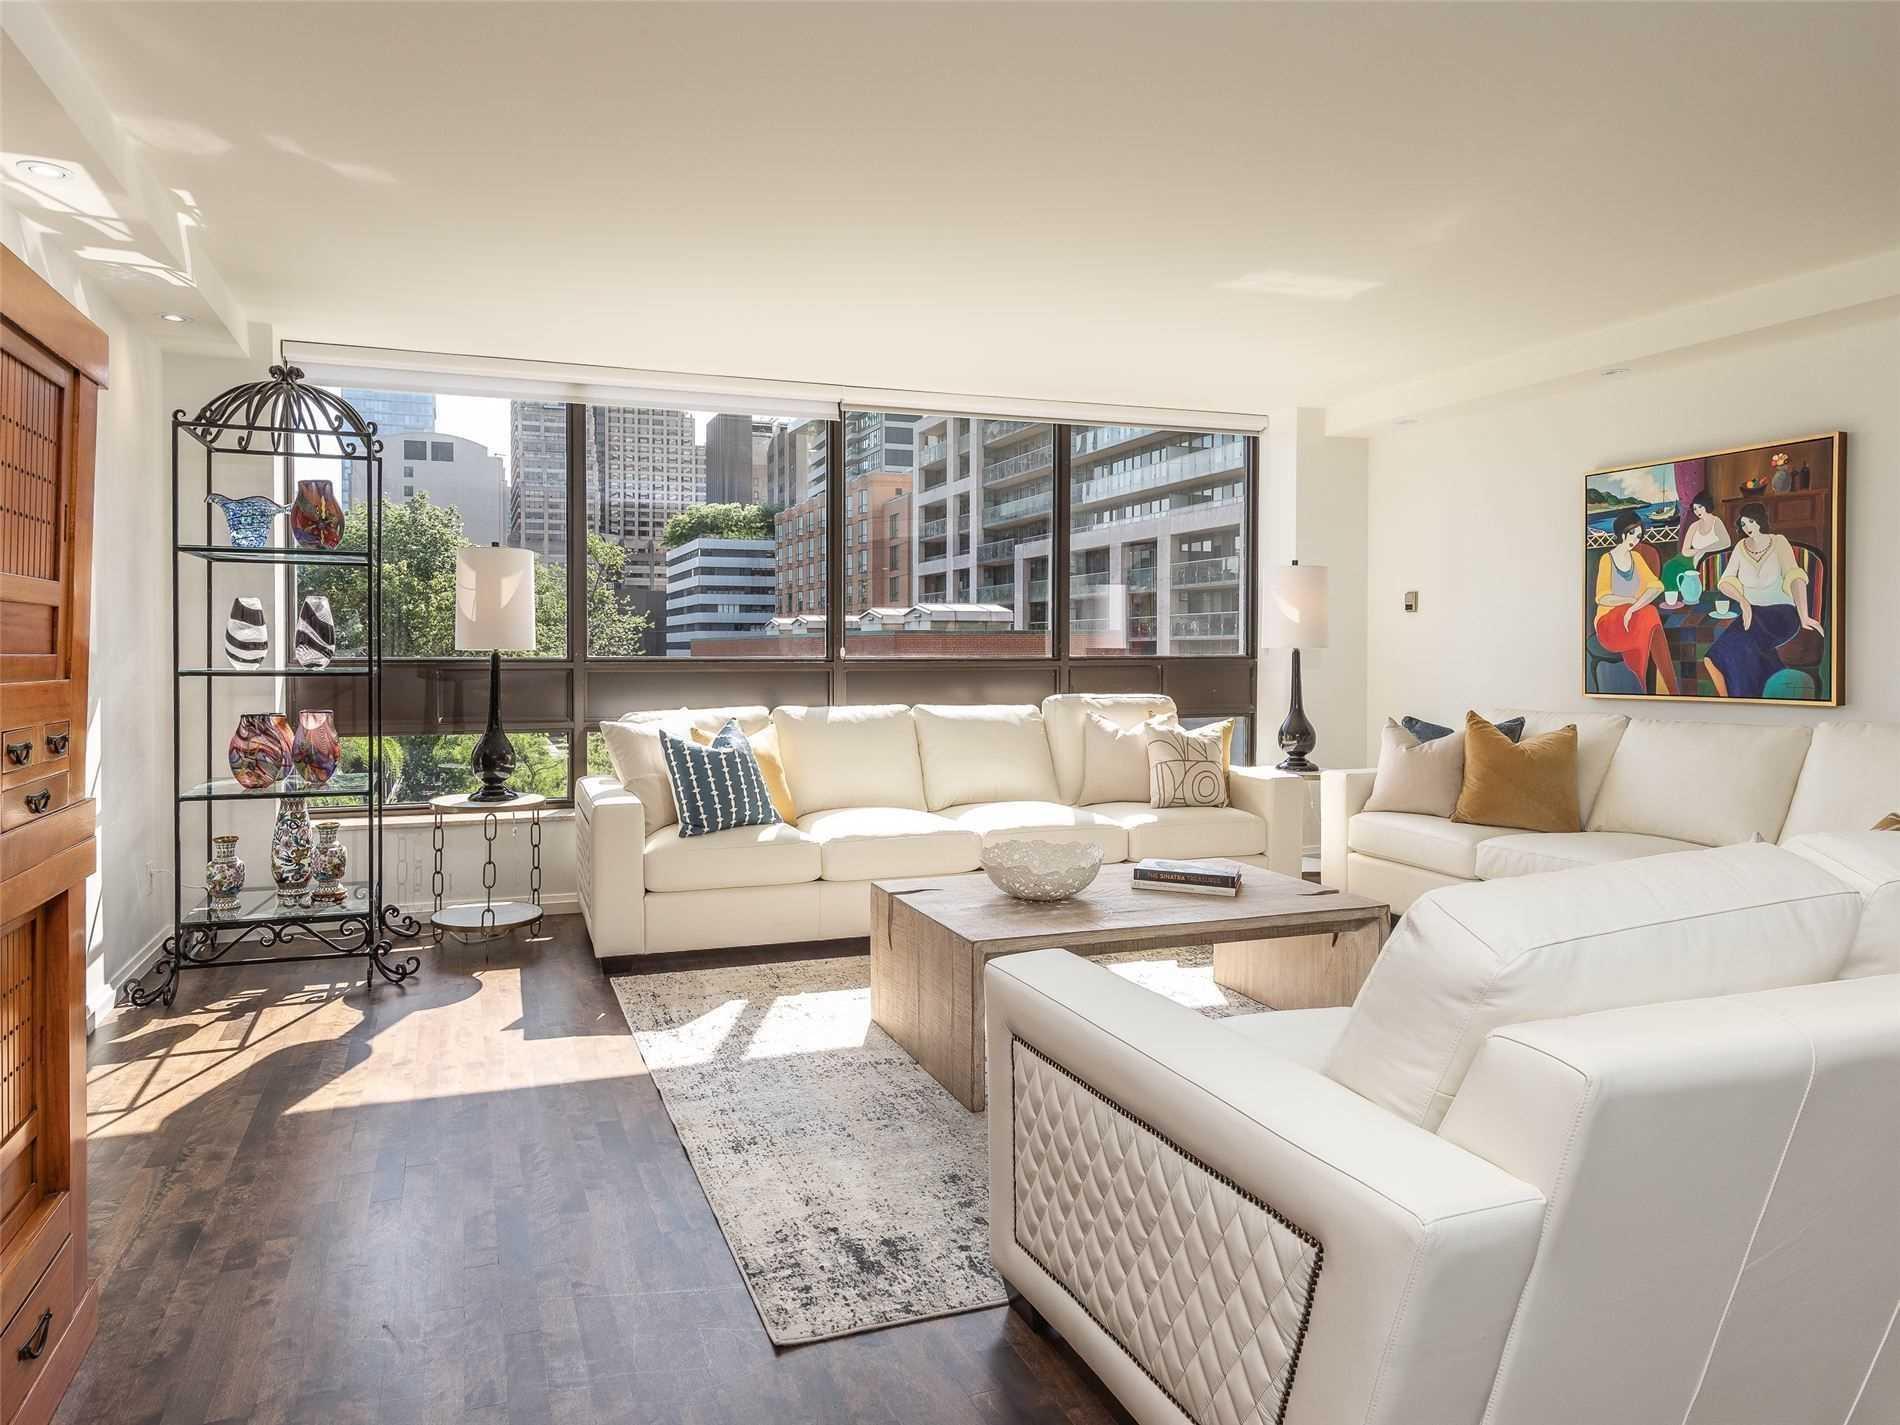 55 Prince Arthur Ave, Toronto, Ontario M5R1B3, 3 Bedrooms Bedrooms, 7 Rooms Rooms,4 BathroomsBathrooms,Condo Apt,For Sale,Prince Arthur,C5361670